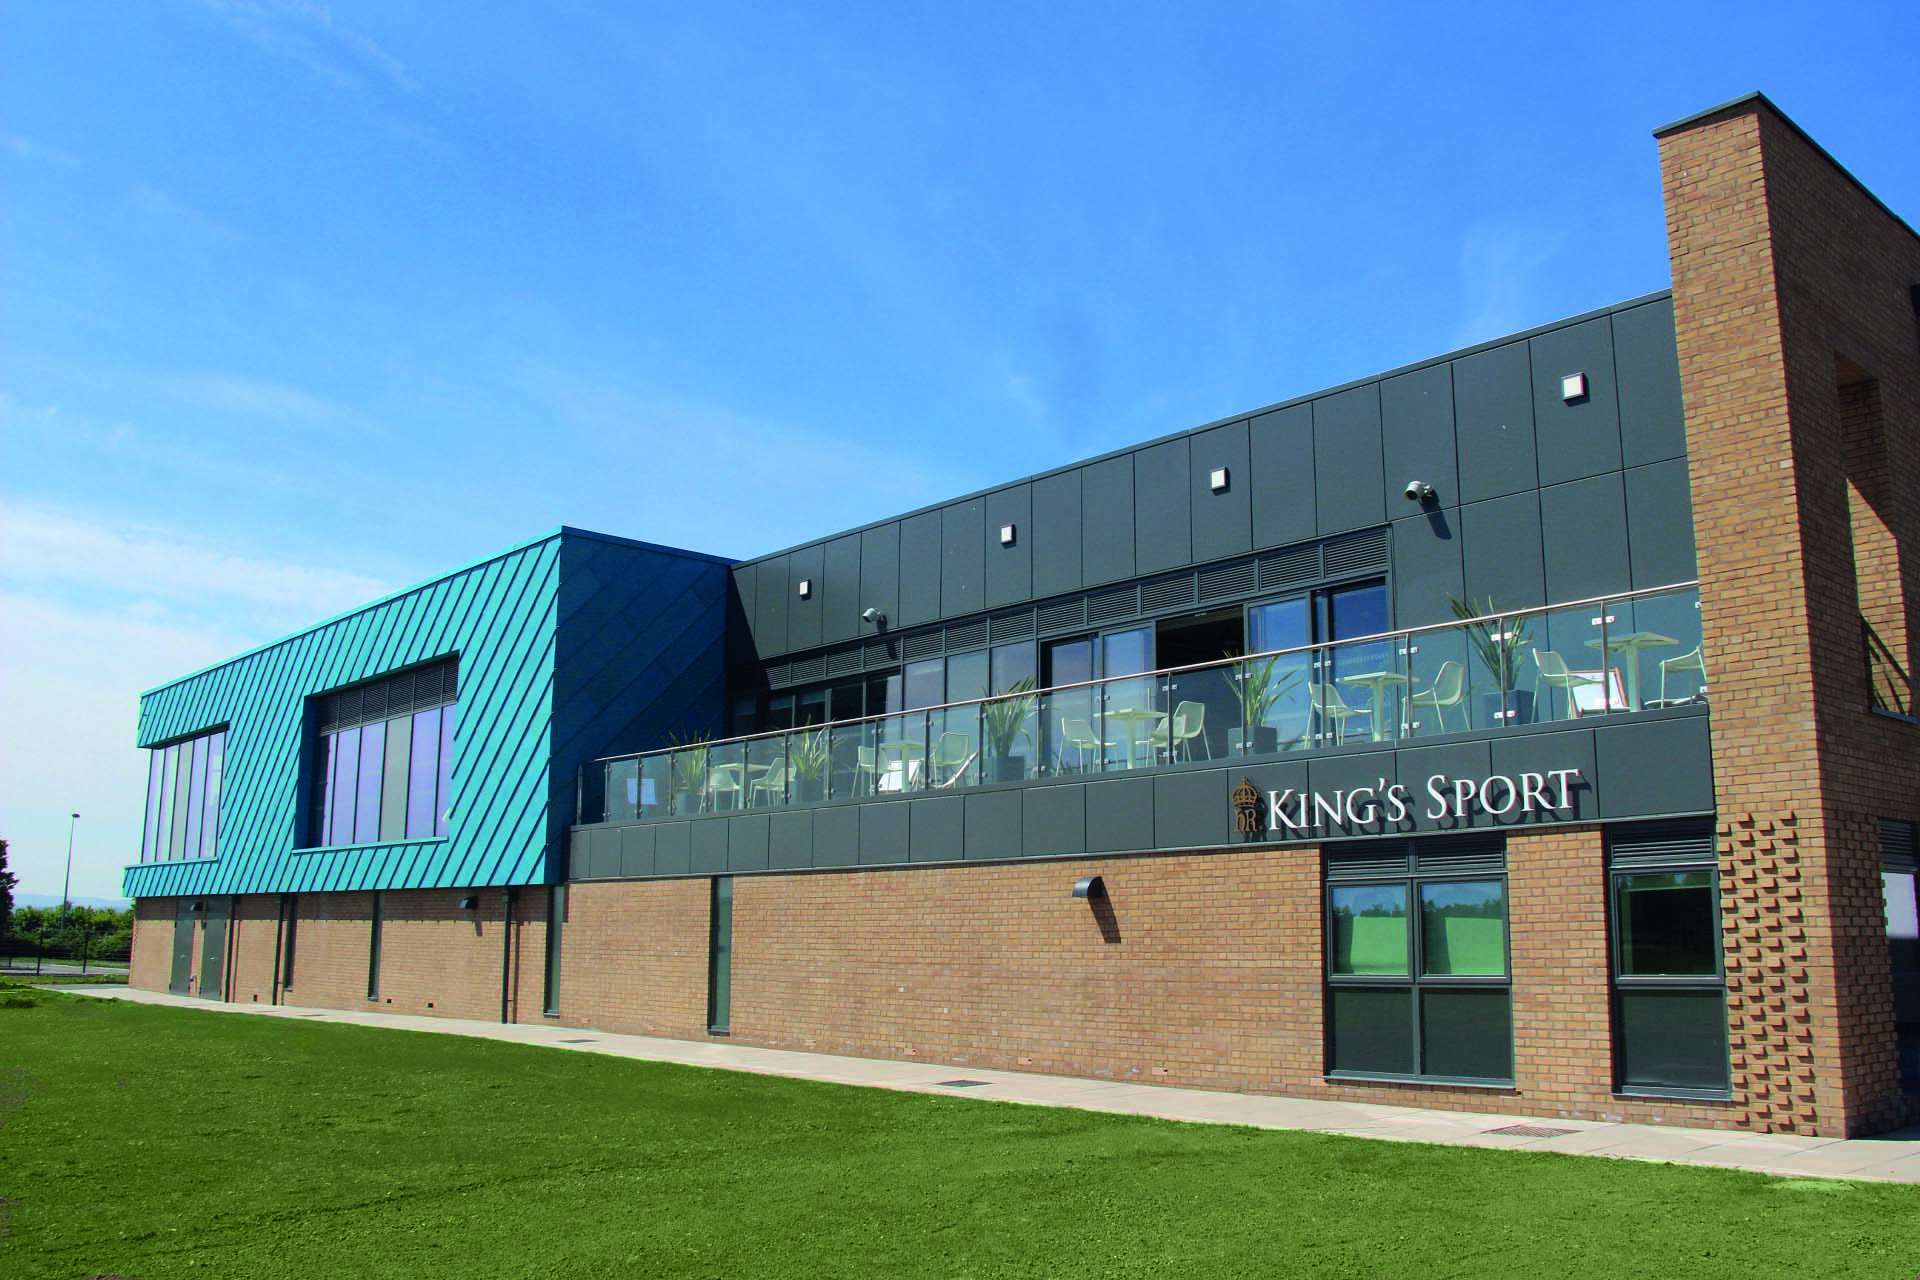 The King's School sport